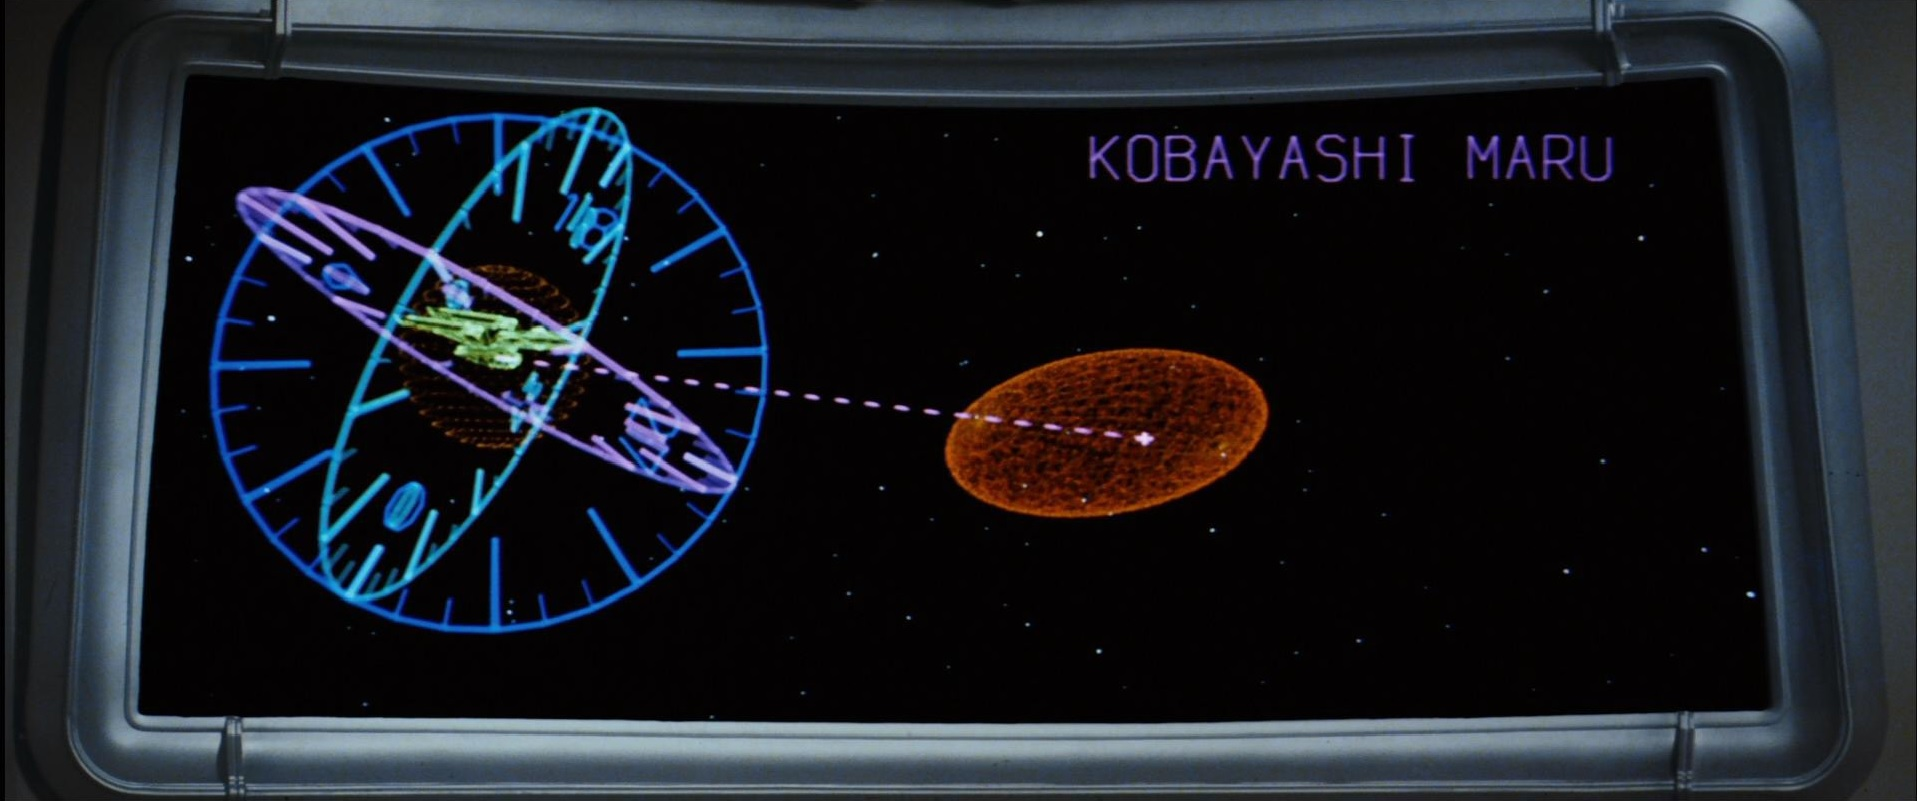 Klingonische Neutrale Zone